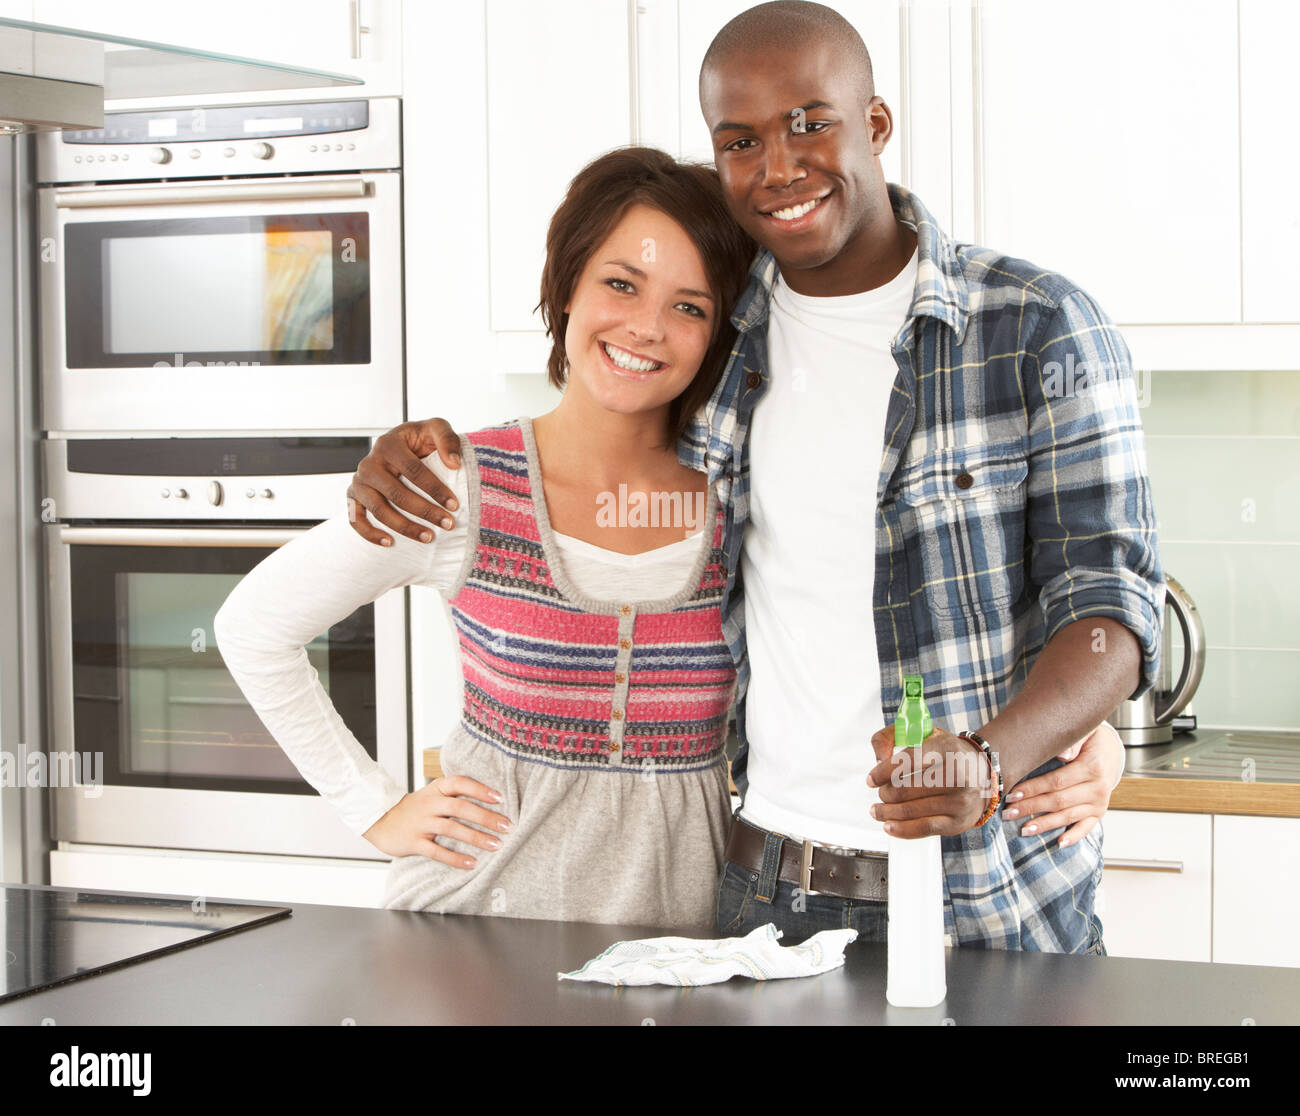 Busco pareja para que li.pie cocine [PUNIQRANDLINE-(au-dating-names.txt) 32